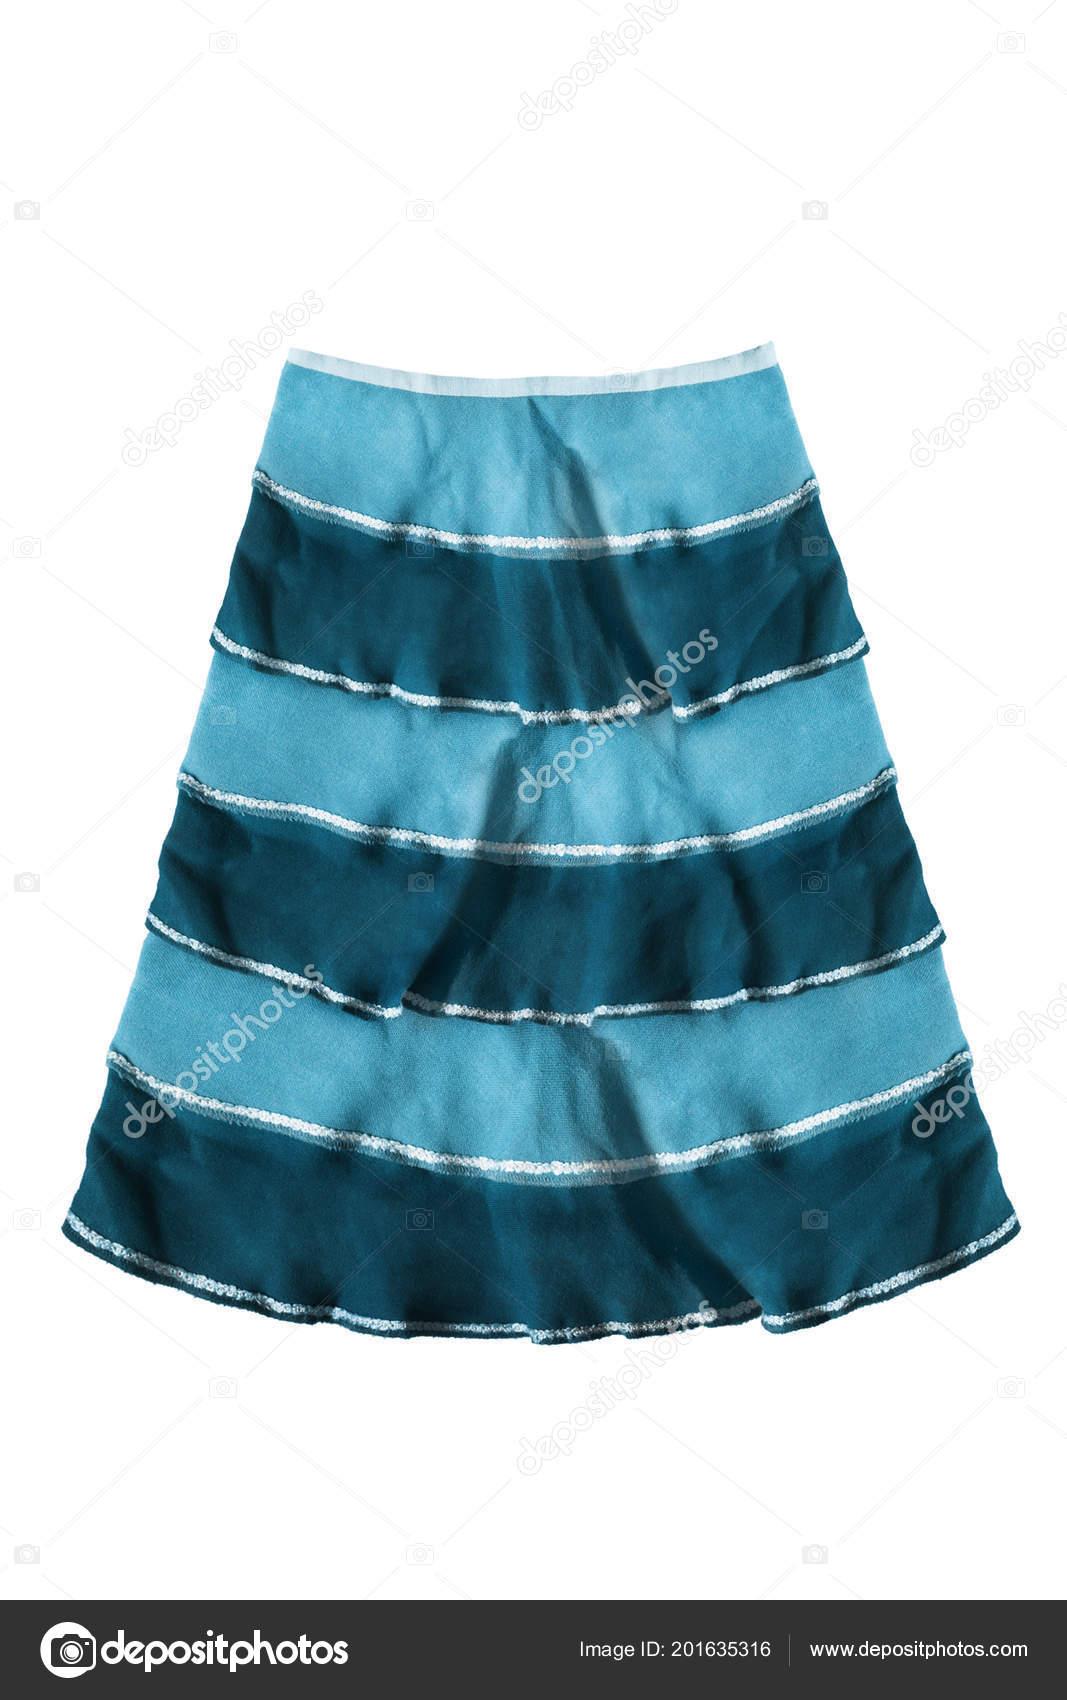 5fa9f9157daacc Blauwe gestreepte uitlopende rok op witte achtergrond — Foto van ...